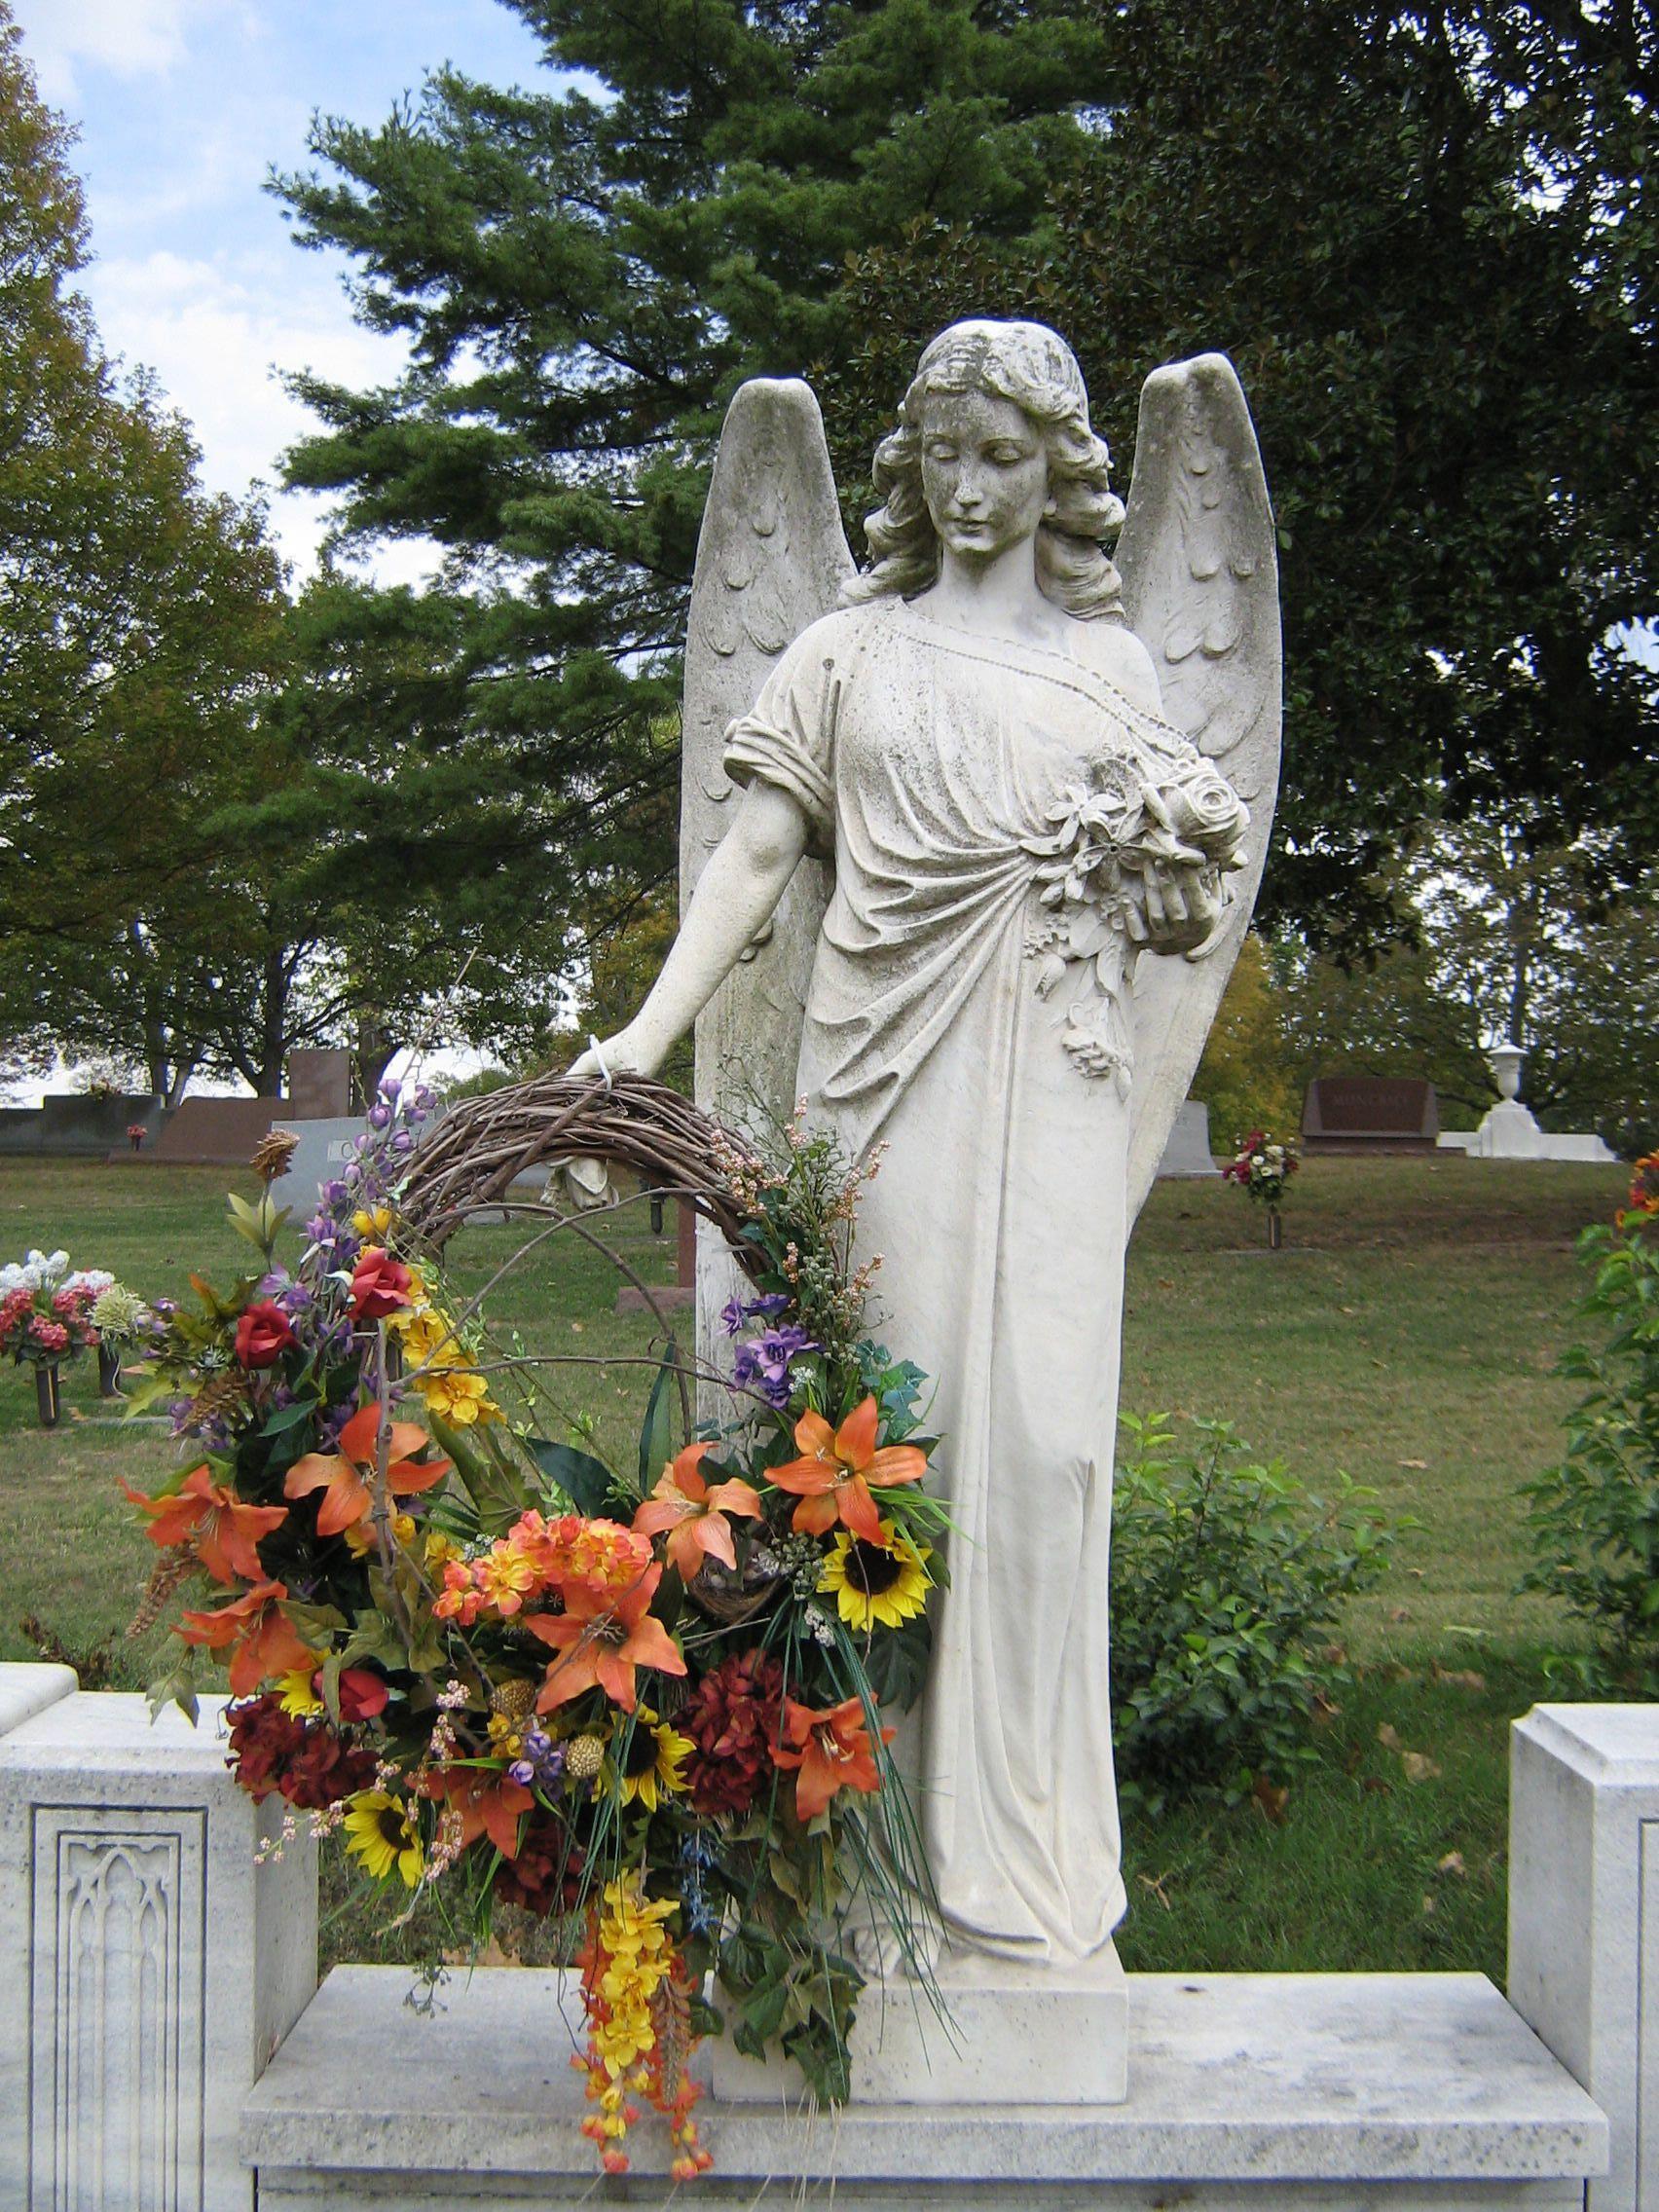 the stone angel symbols